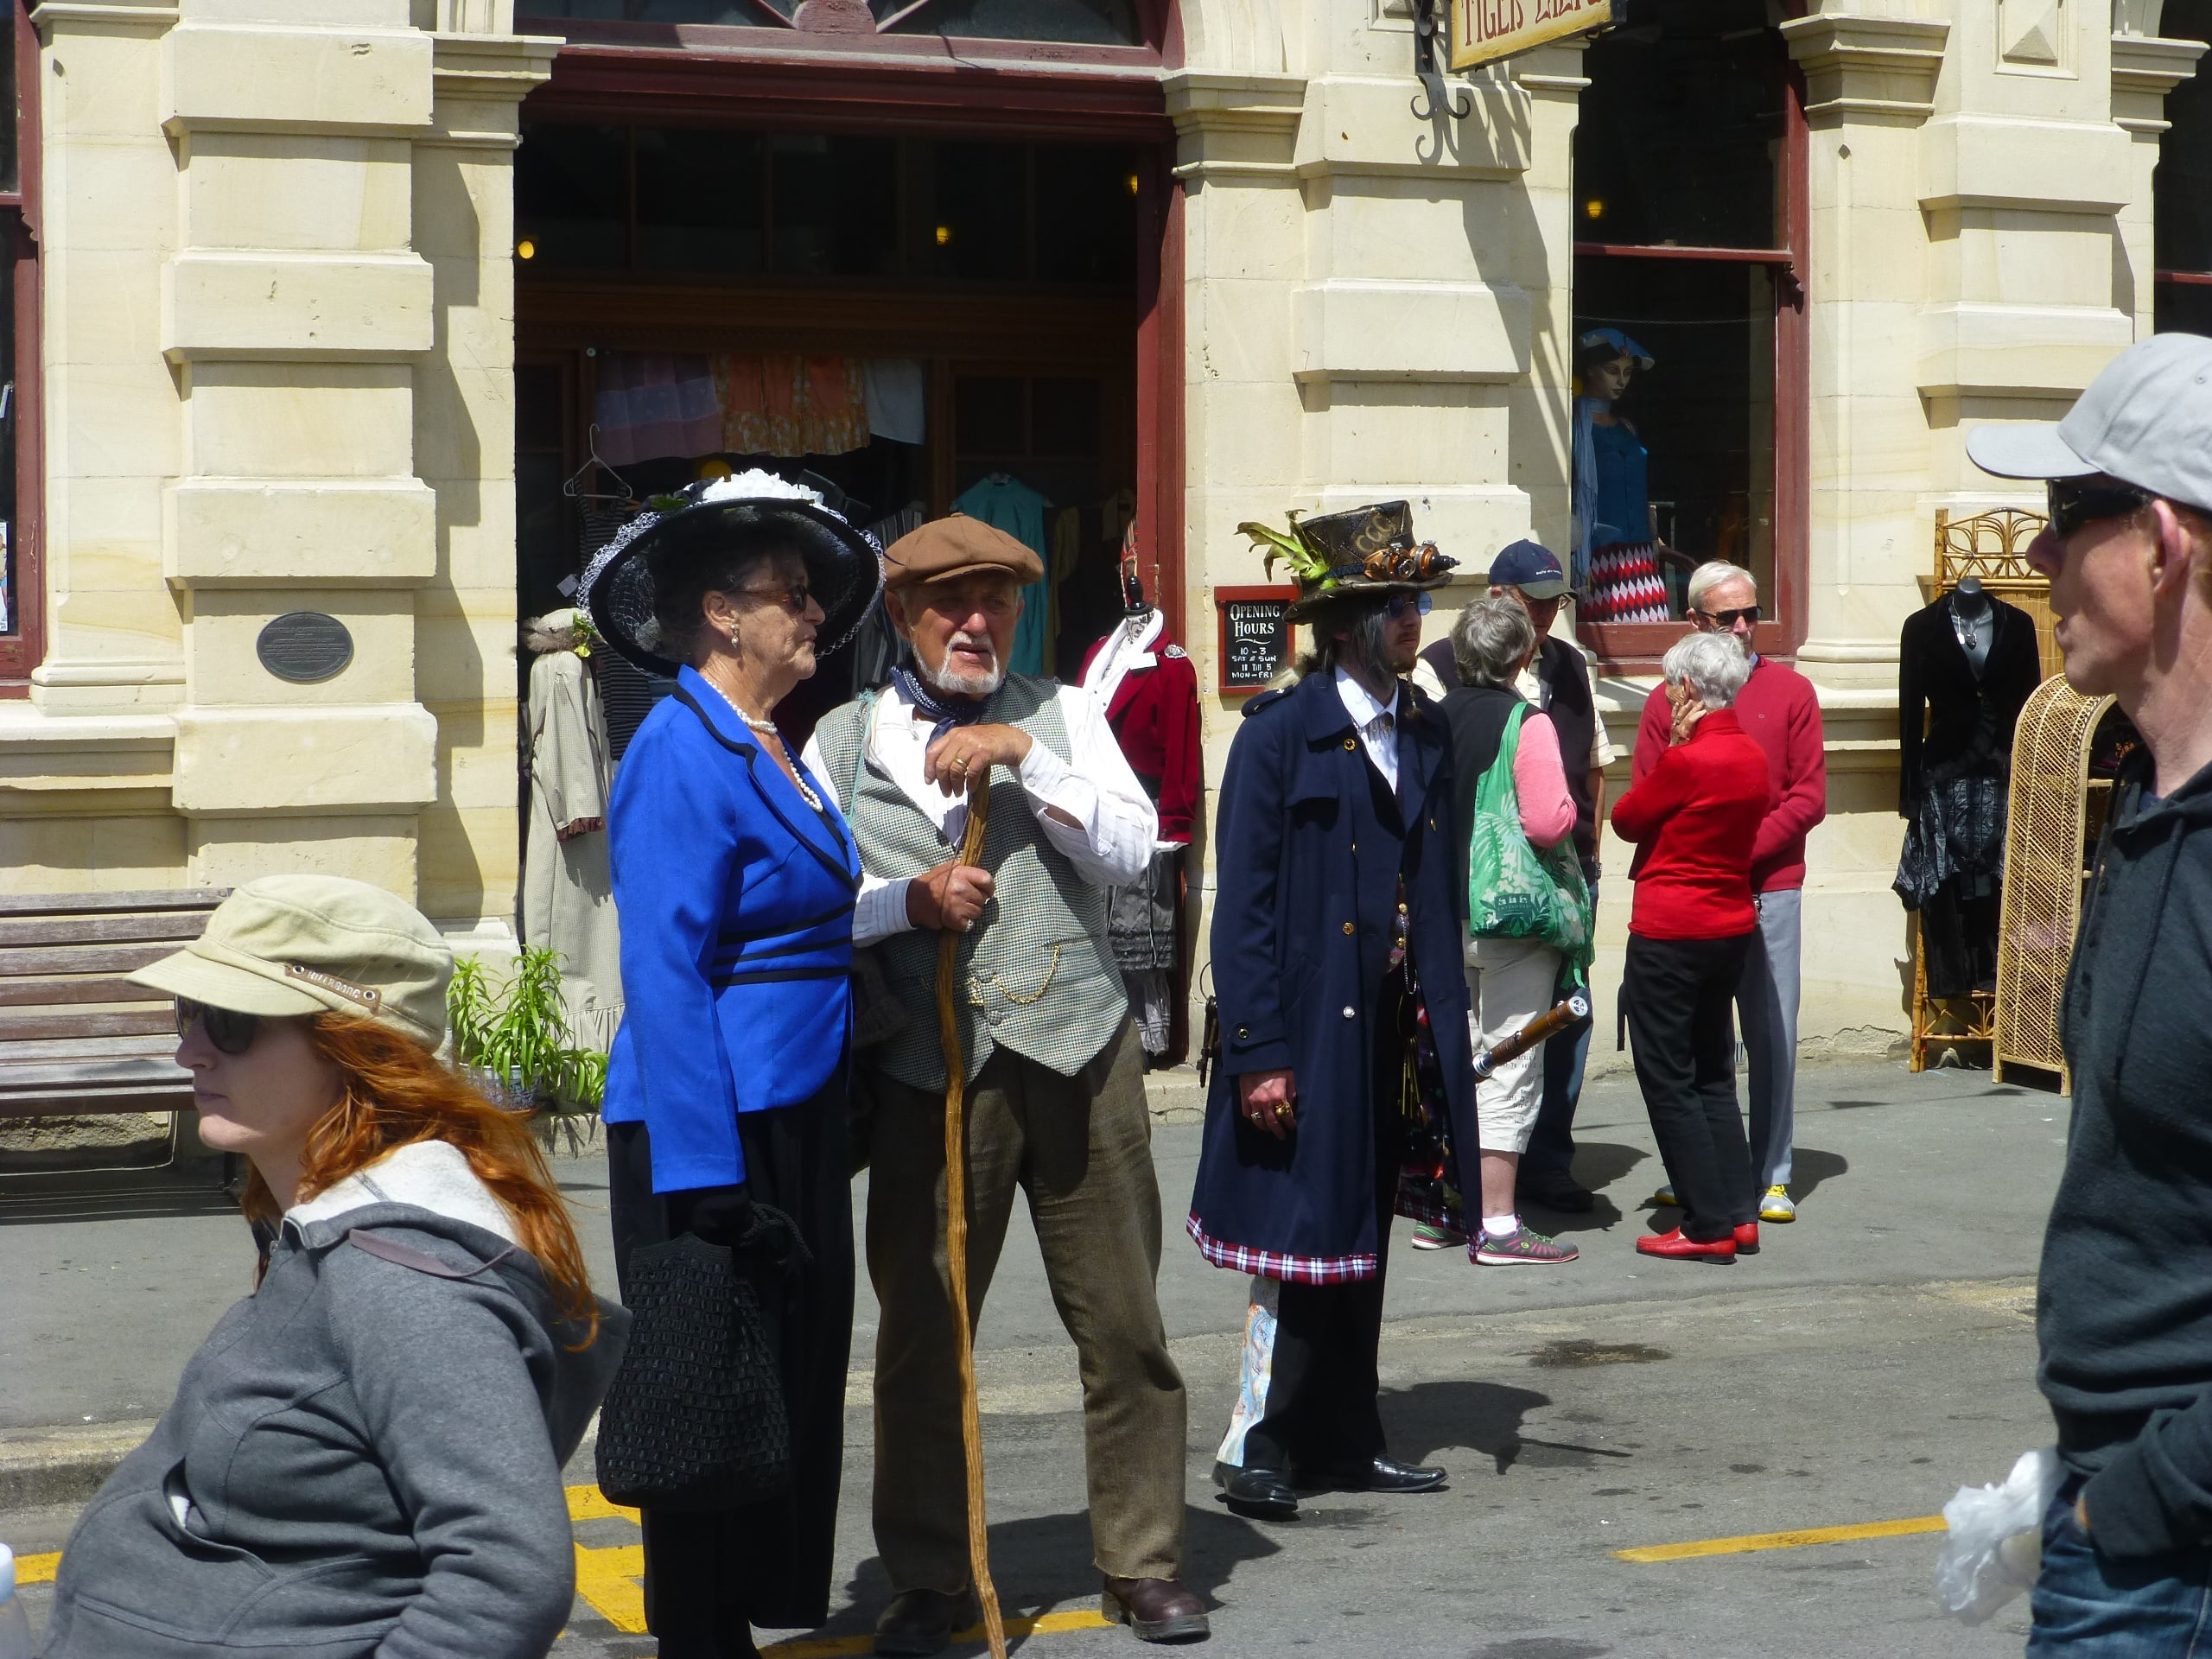 Viktorian Festival in Oamaru 31